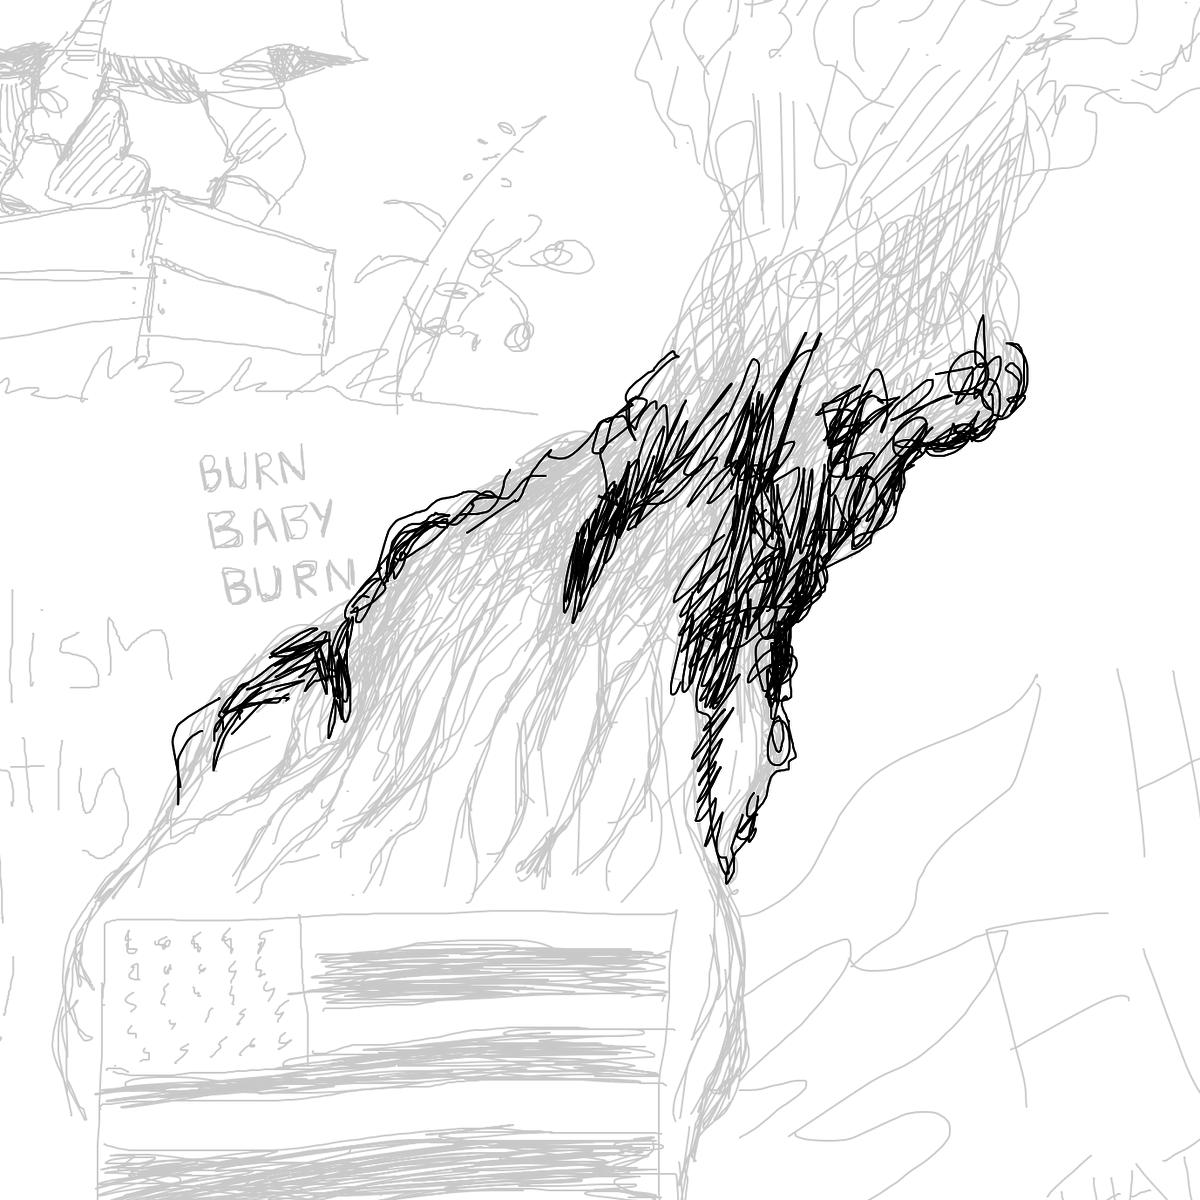 BAAAM drawing#6017 lat:51.5068054199218750lng: -0.1636428982019424